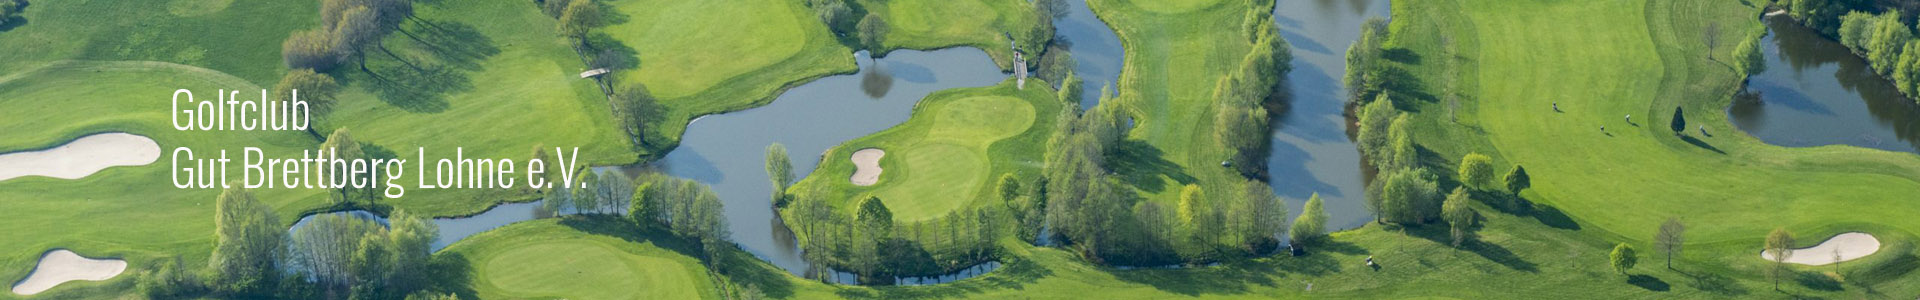 Golfclub Gut Brettberg Lohne